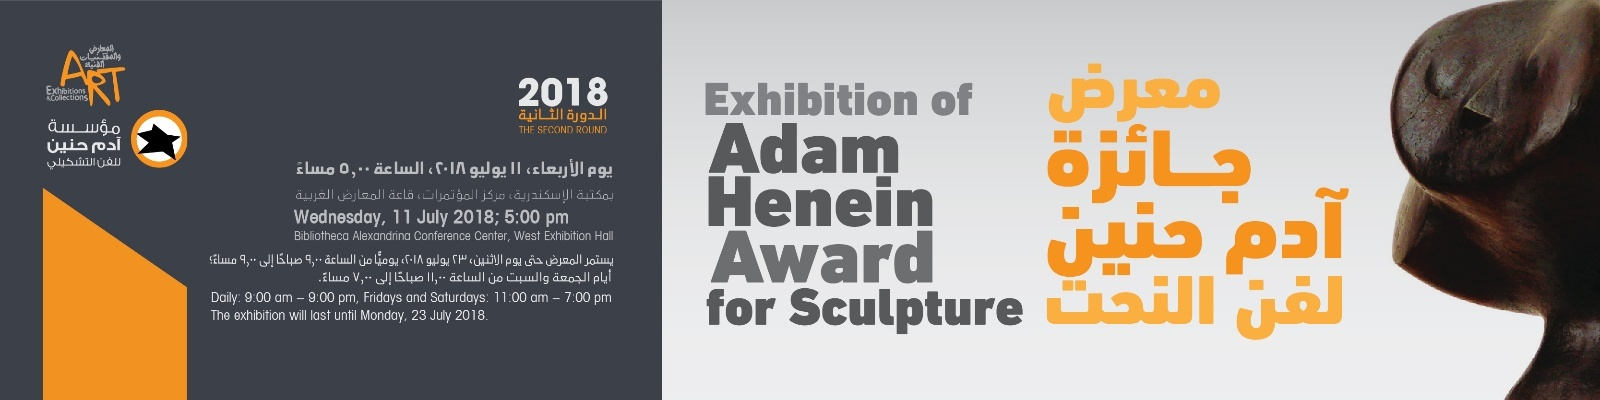 Second Round of the Adam Henein Annual Sculpture Prize Exhibition